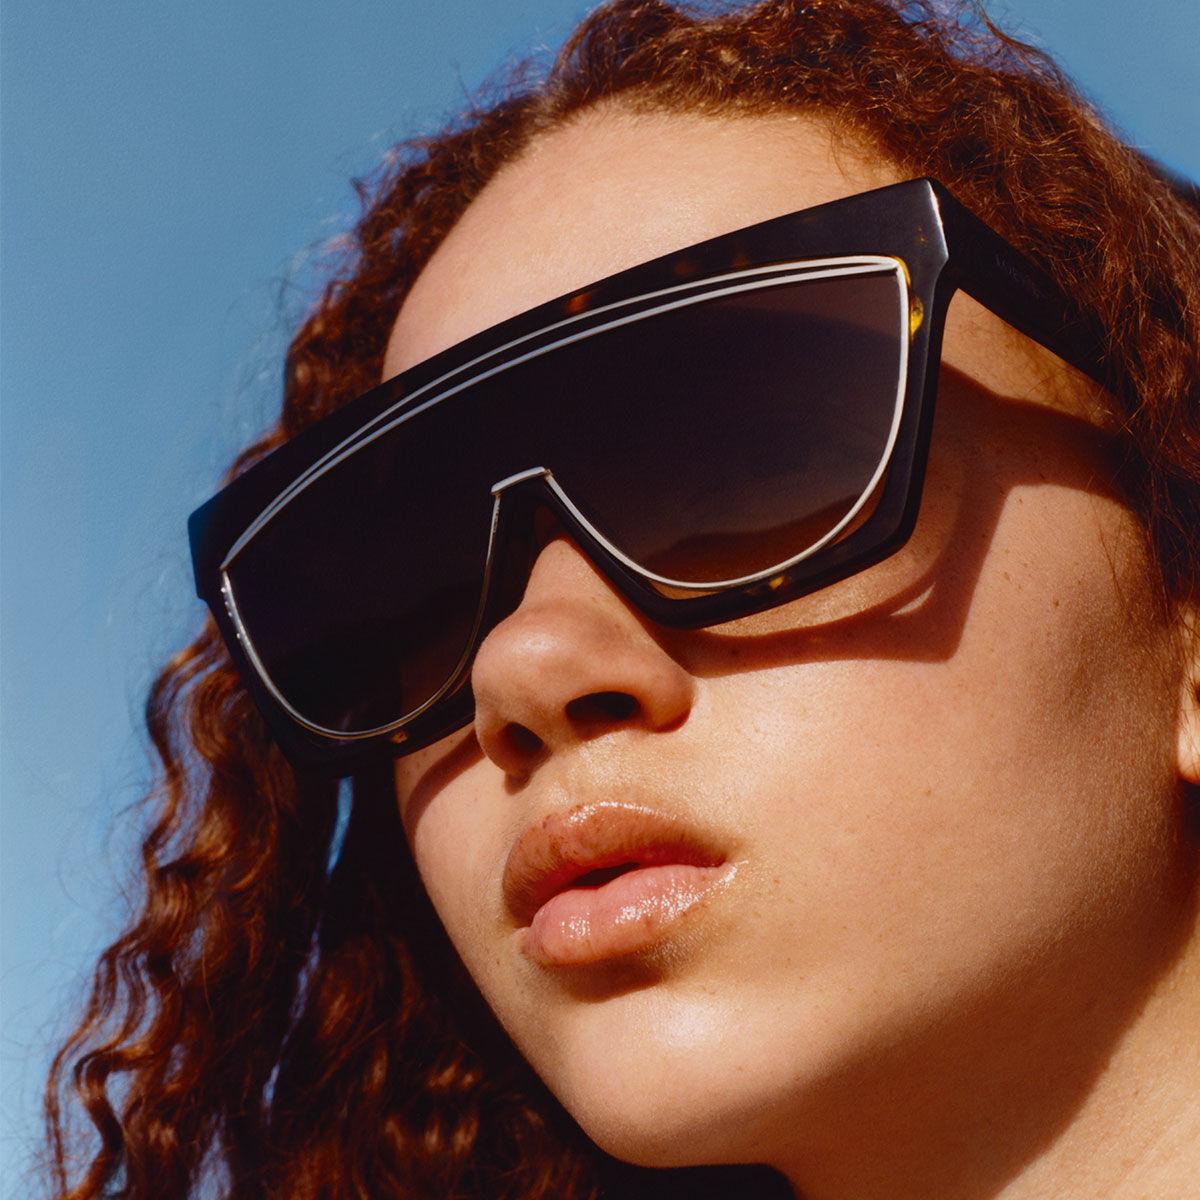 LOEWE Masque Sunglasses Black/Gradient Smoke front